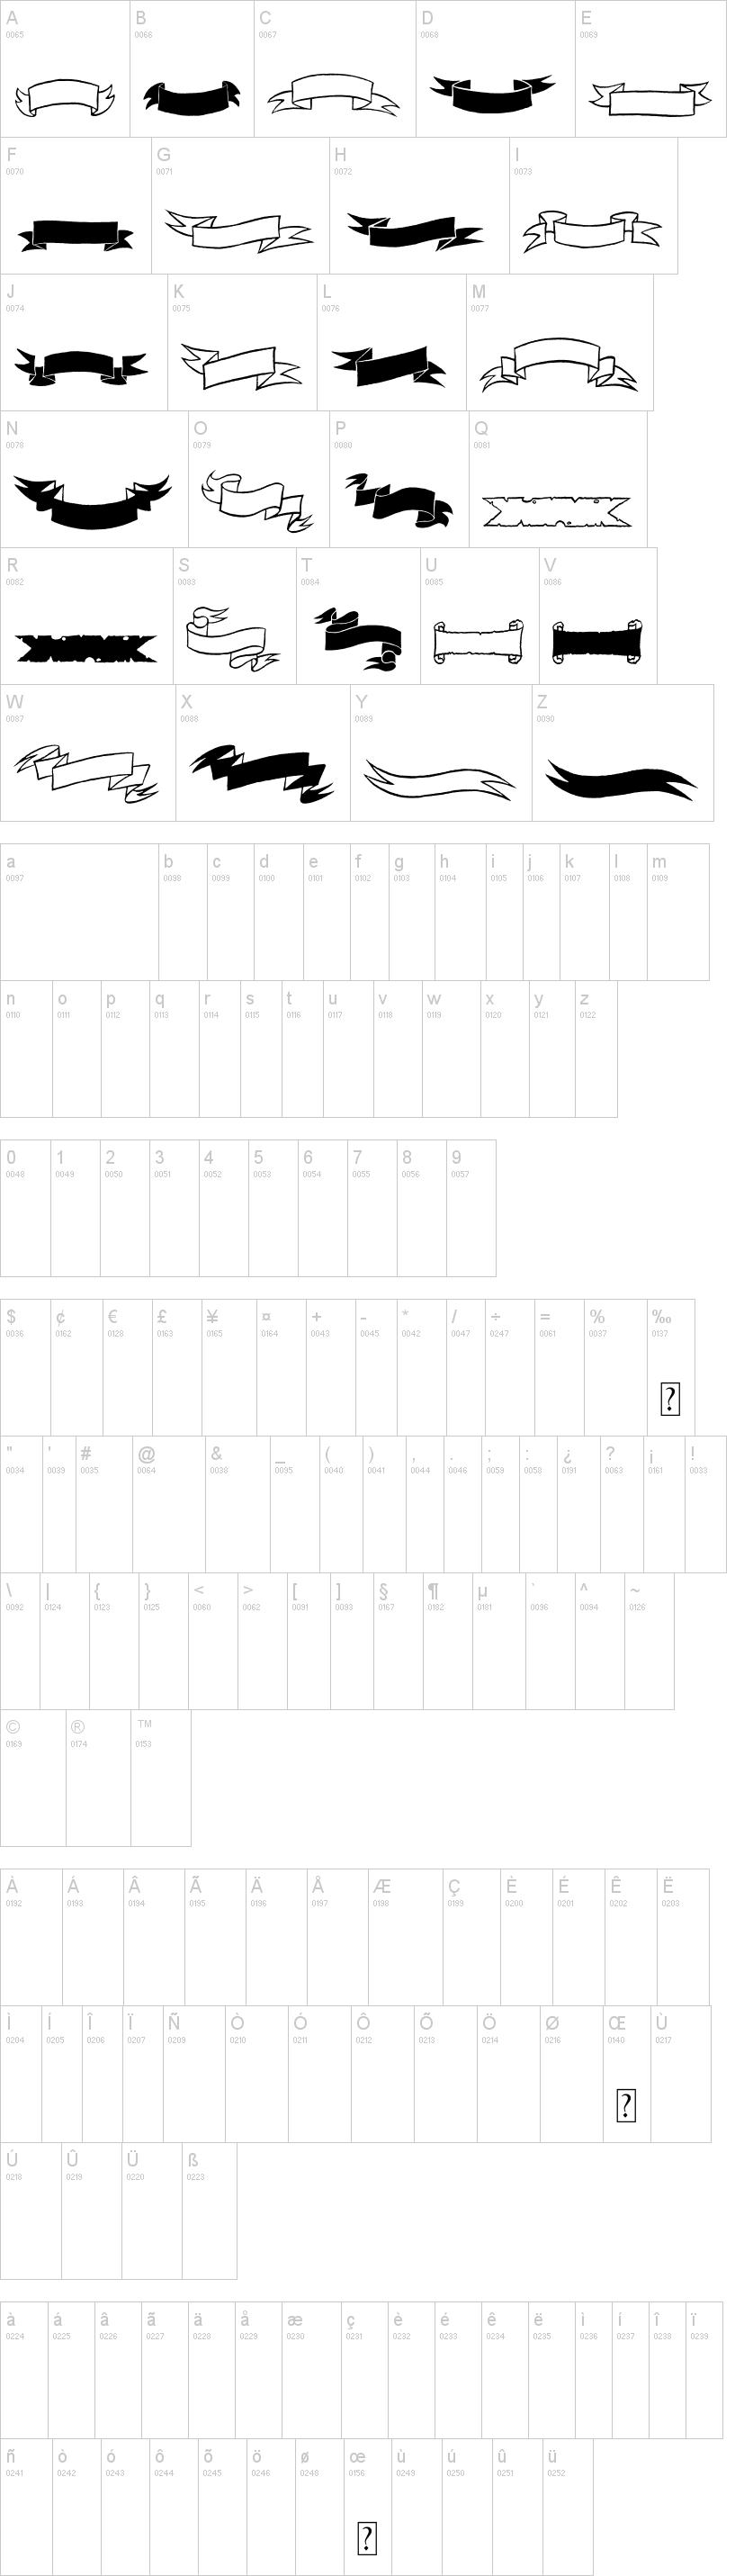 how to make black banner